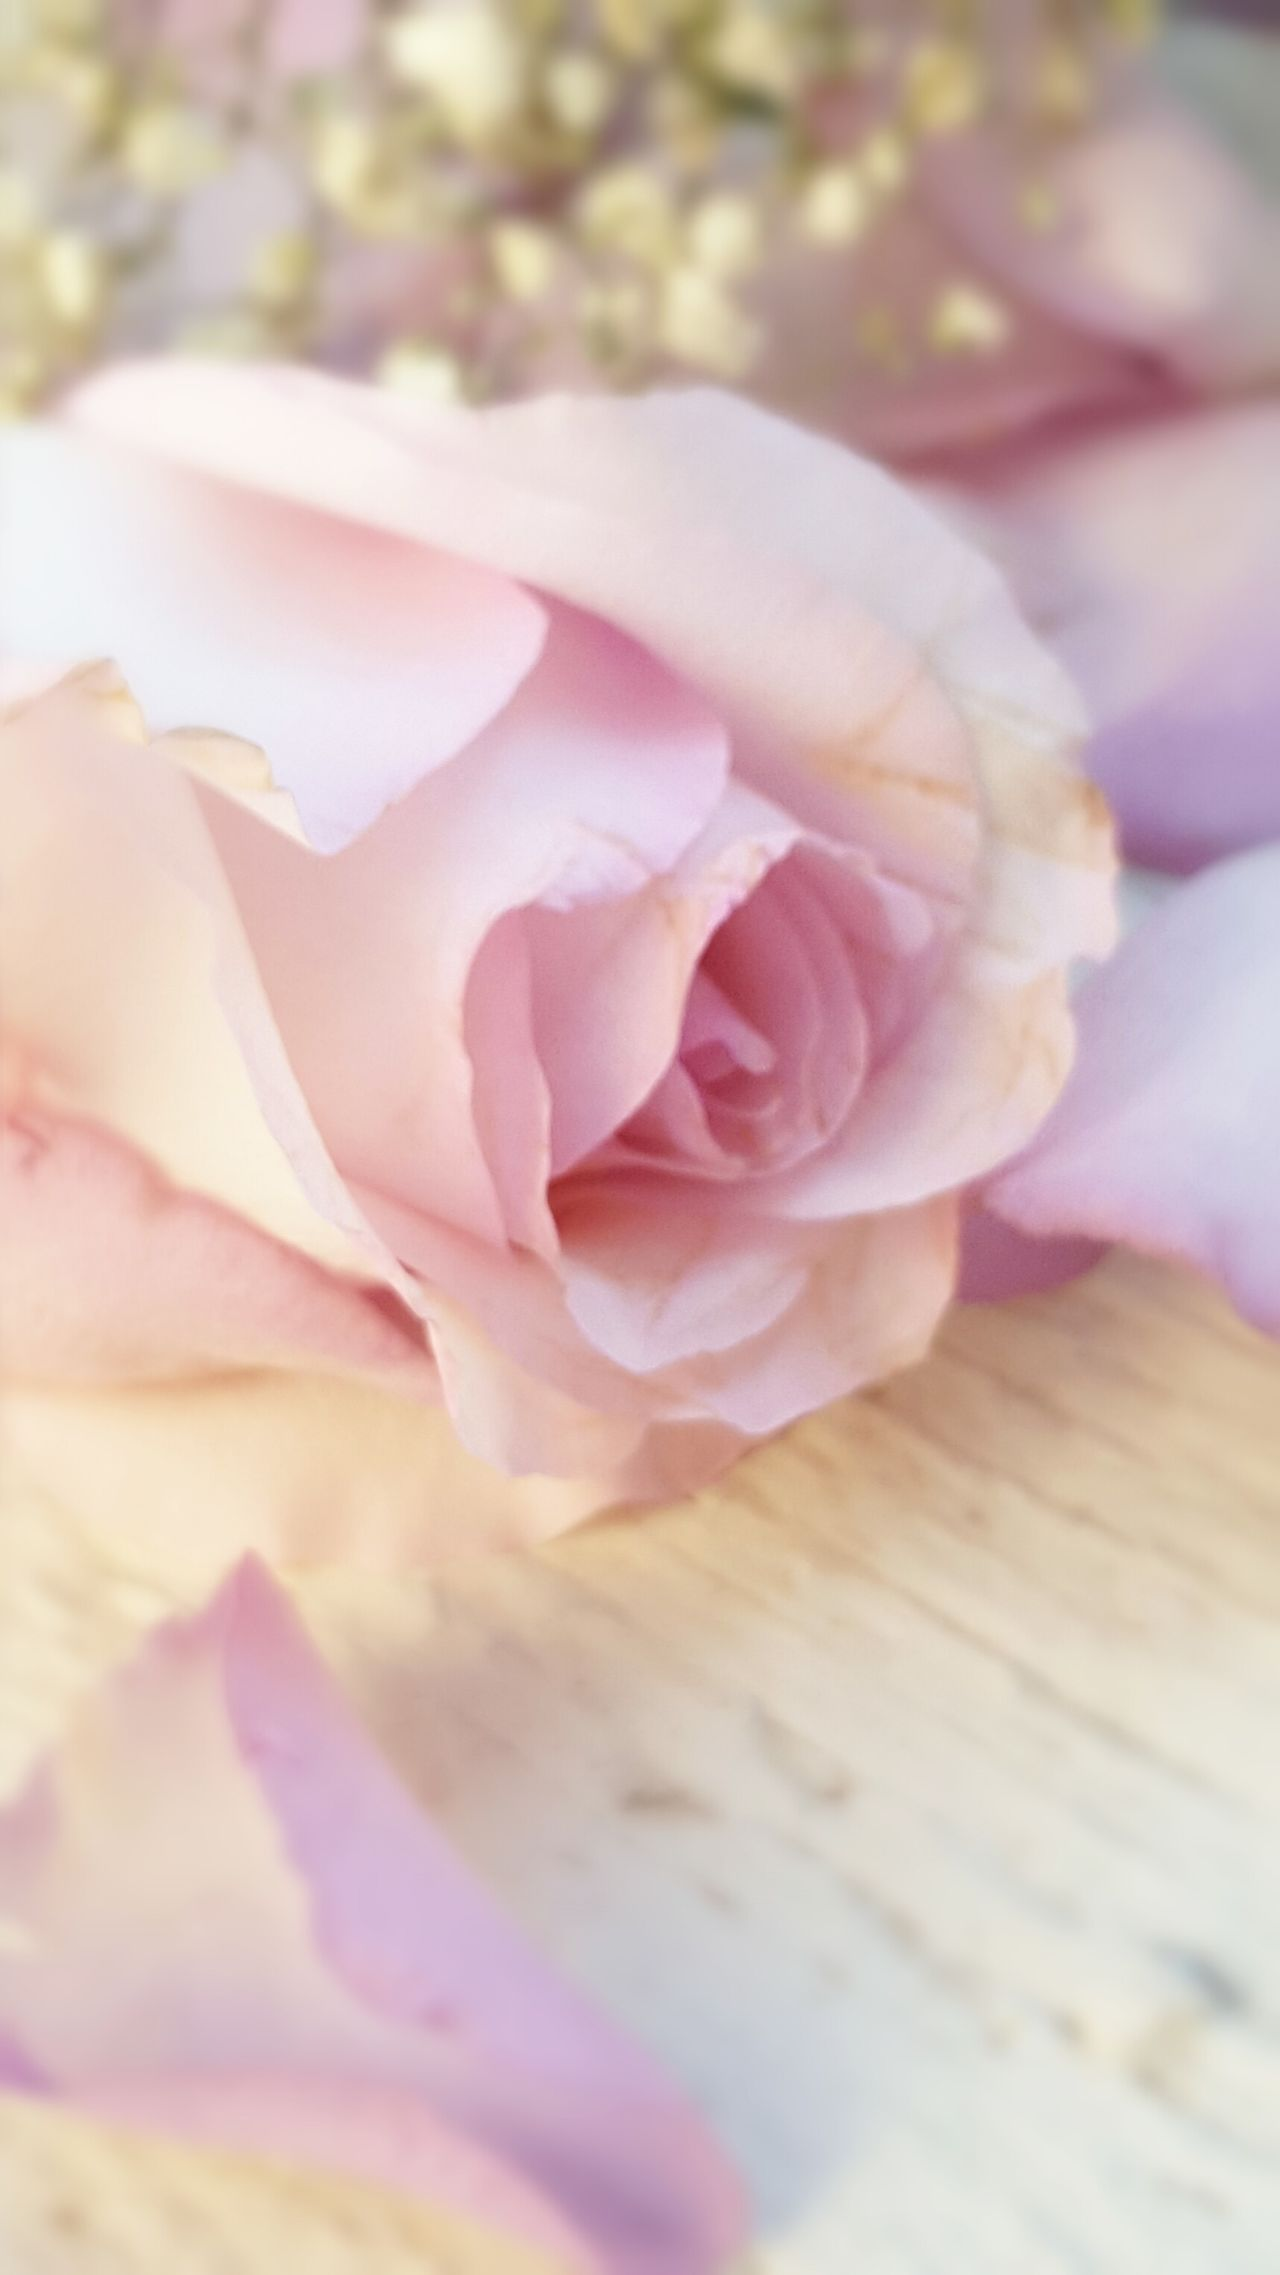 Roses Rose - Flower Rose🌹 Rose Garden Roseporn Roses🌹 Rosa ♡ Rosas Rosas Y Espinas